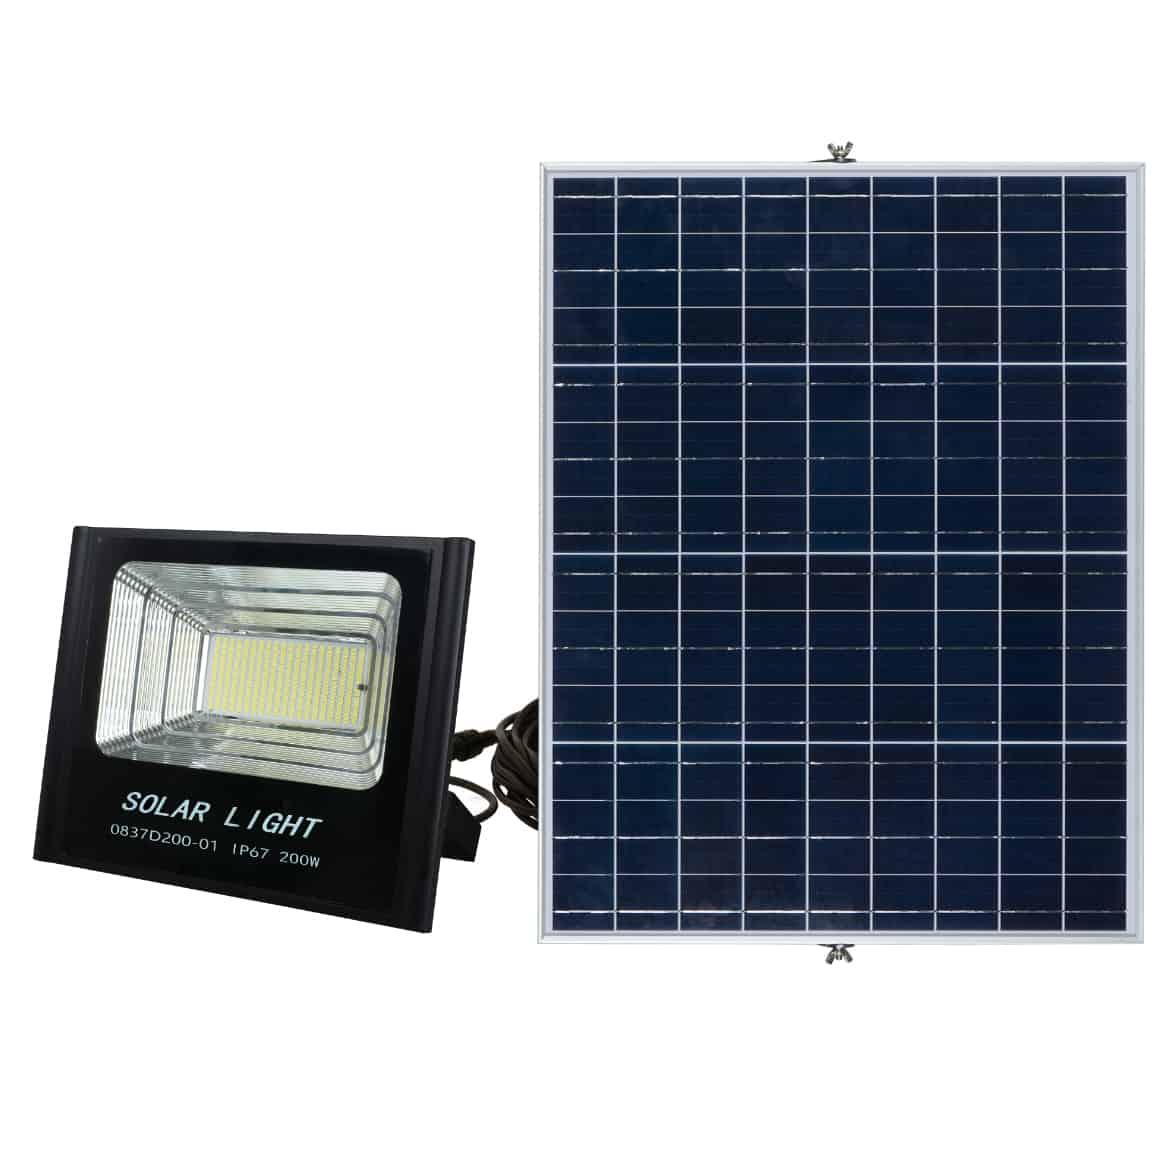 Solar LED Flood Light PLS-FL200W-6K/B